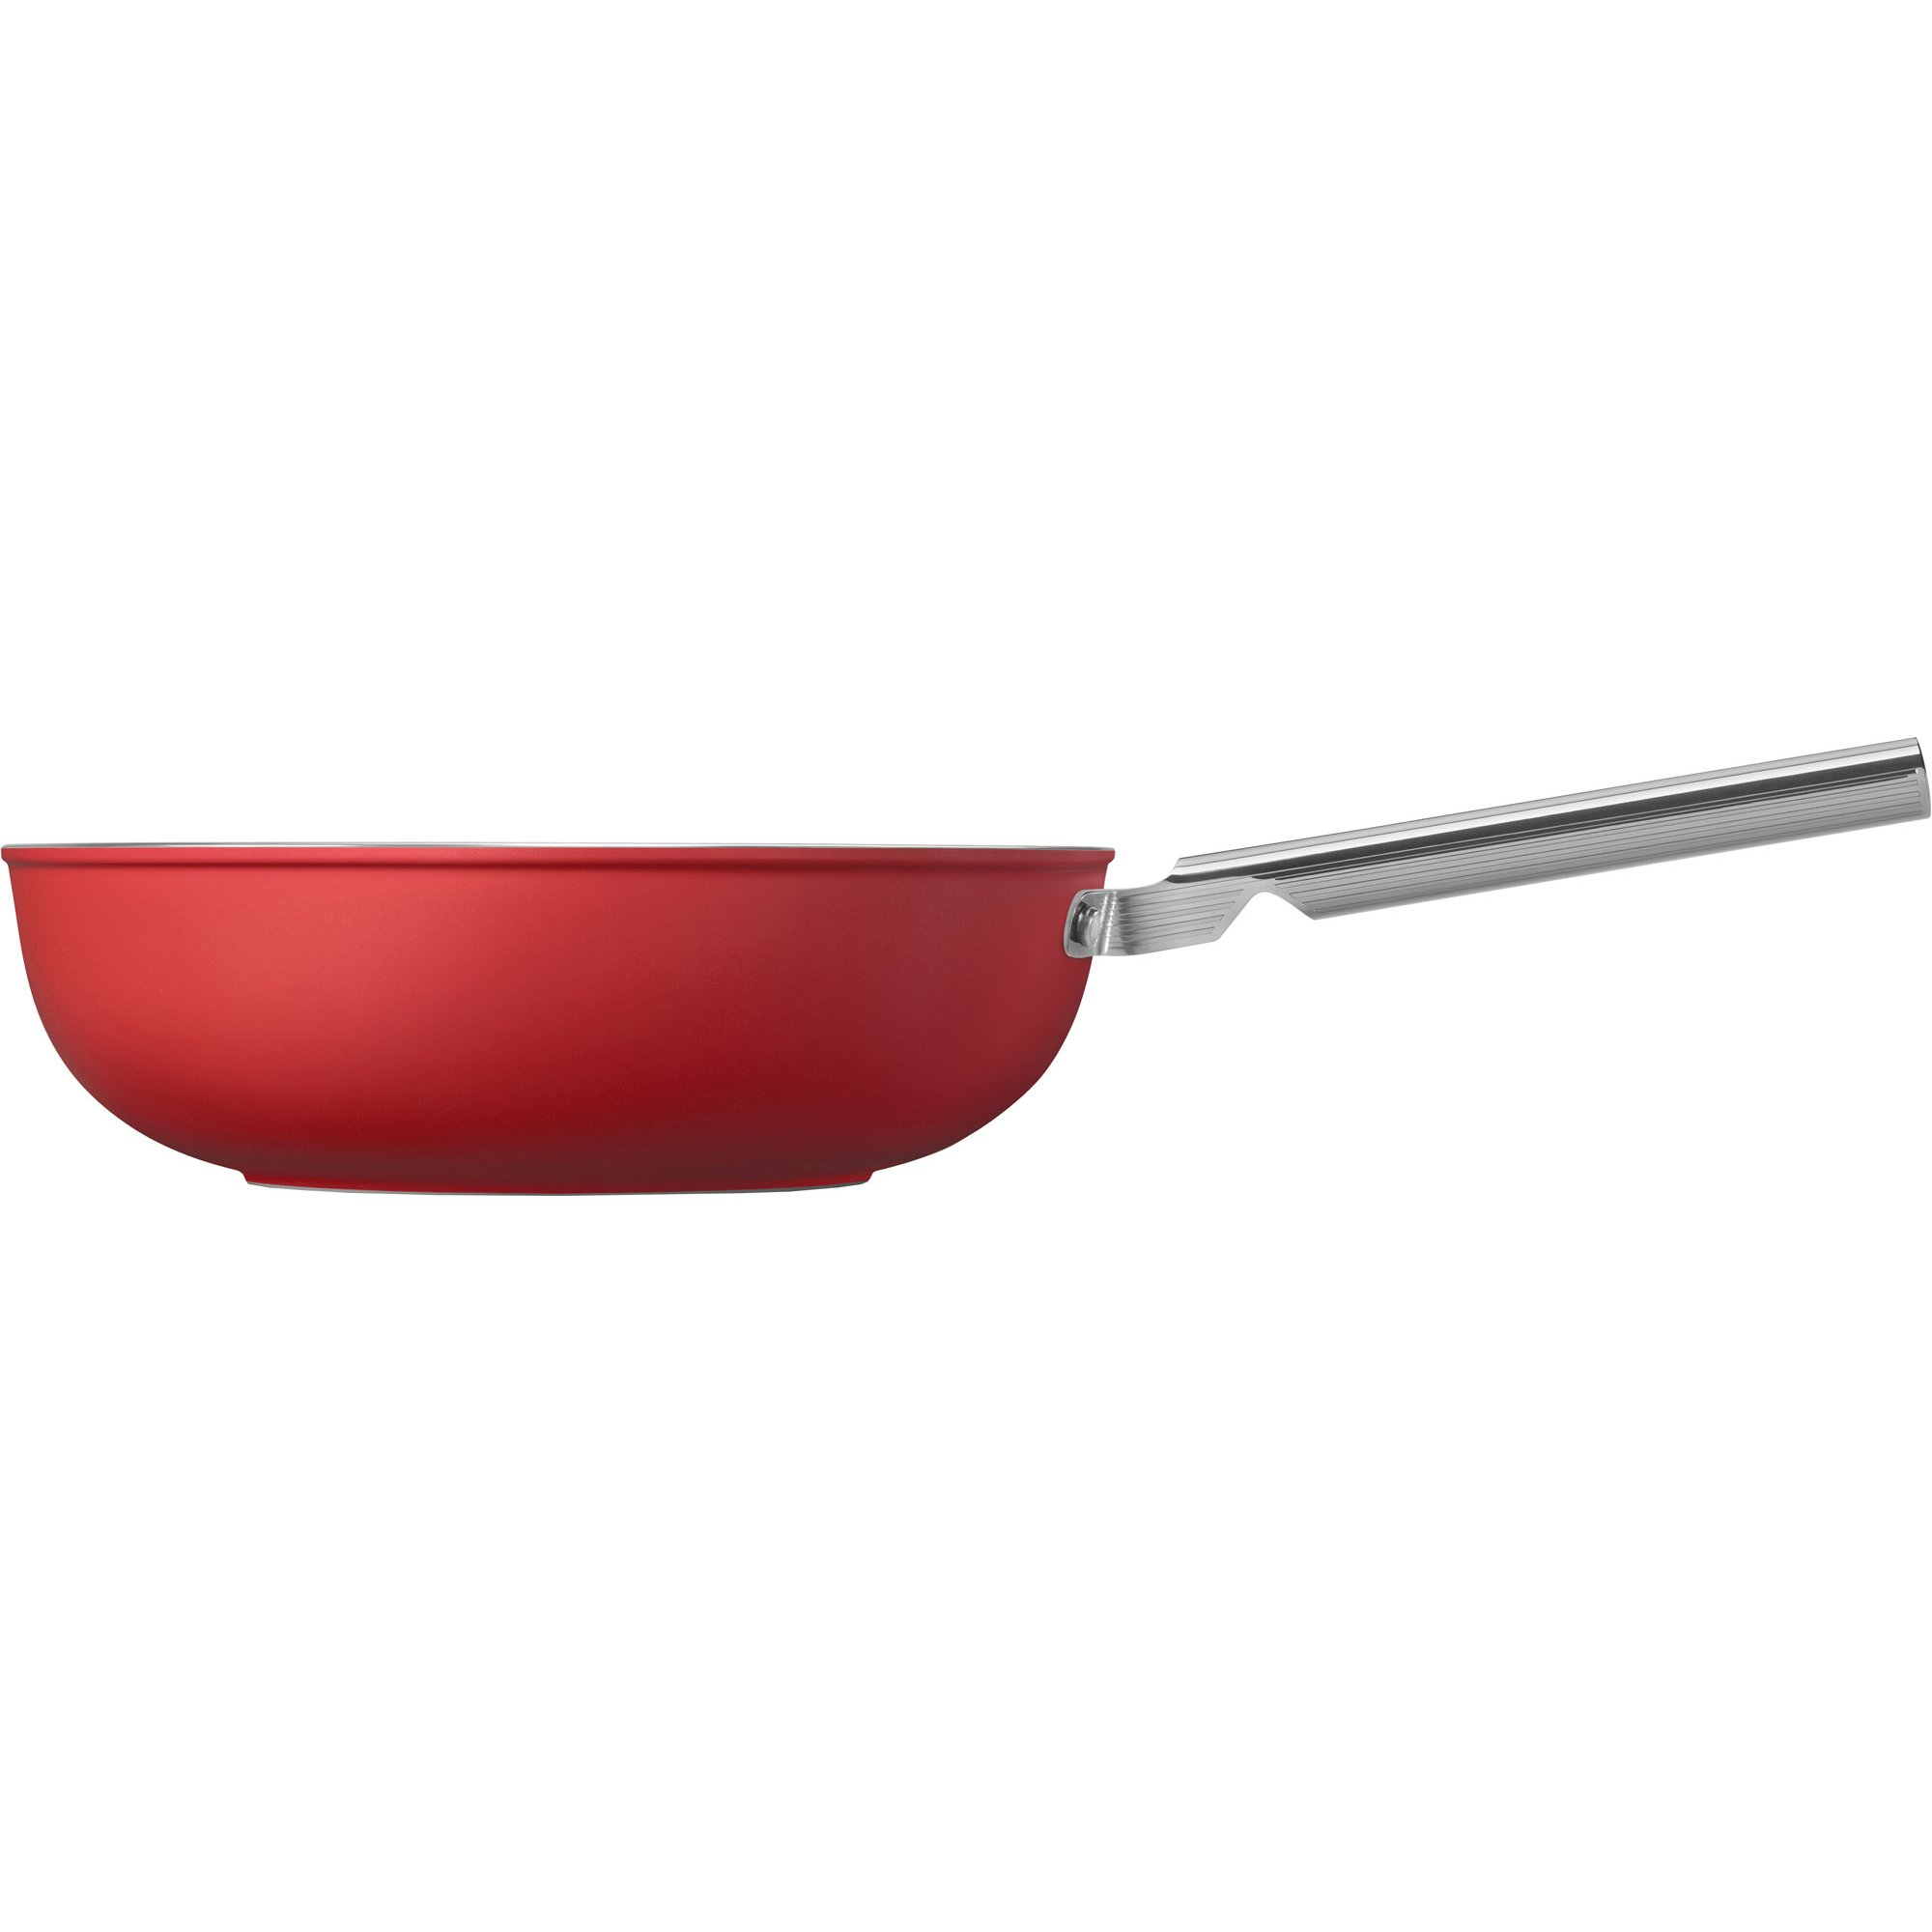 Smeg Wokpanna 30 cm röd